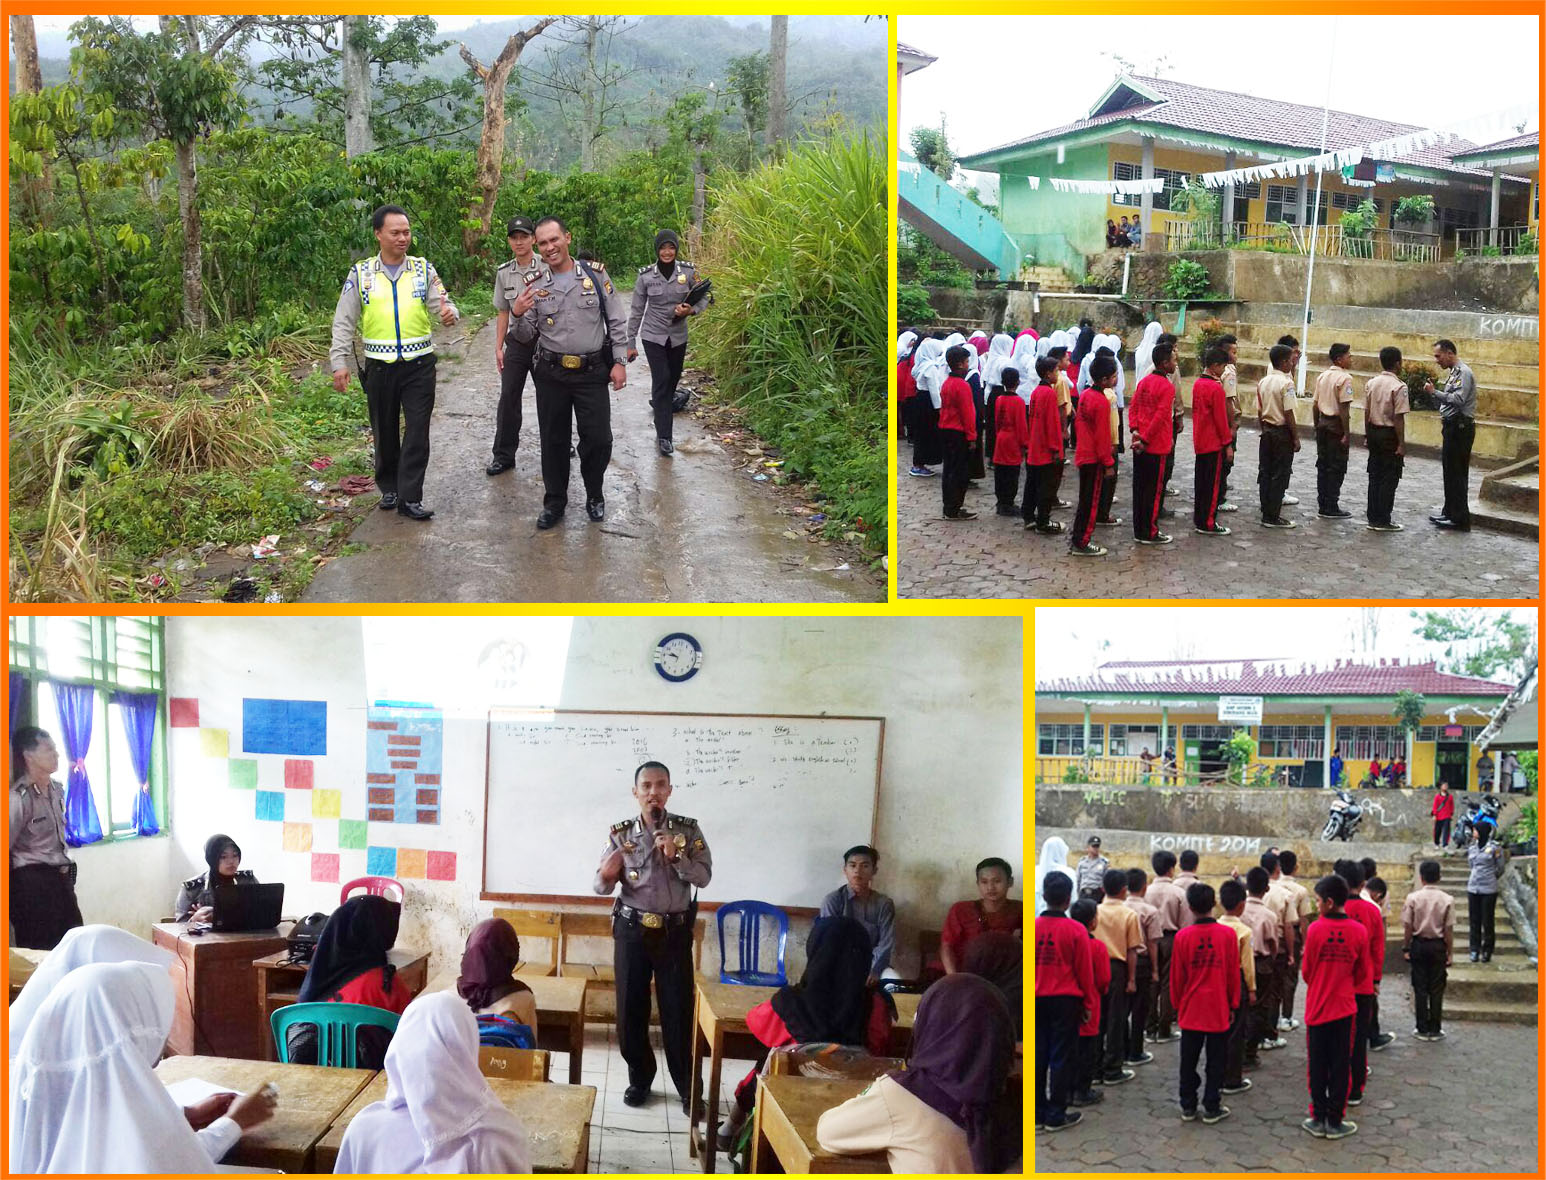 Kolaborasi Satuan Binmas dan Satuan Lalu Lintas Memberikan Penyuluhan Kepada Siswa di Wilayah Pedalaman